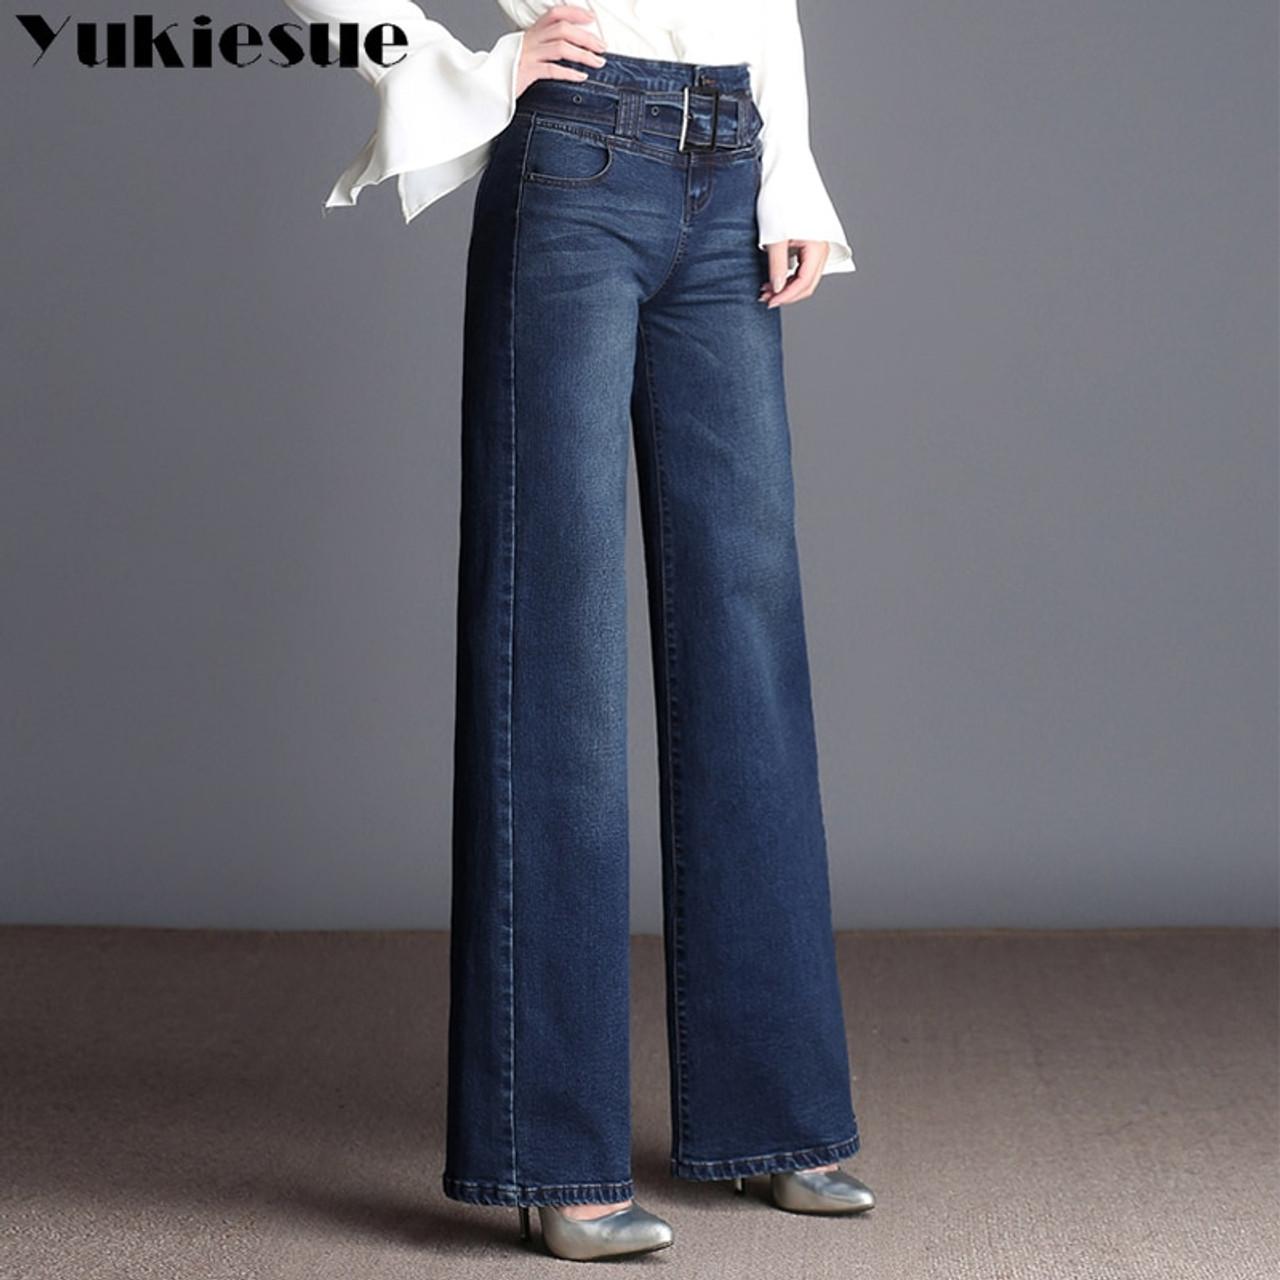 9cde8561d8be8 ... High waist jeans woman 2018 spring Vintage loose casual denim wide leg pants  jeans women Plus ...